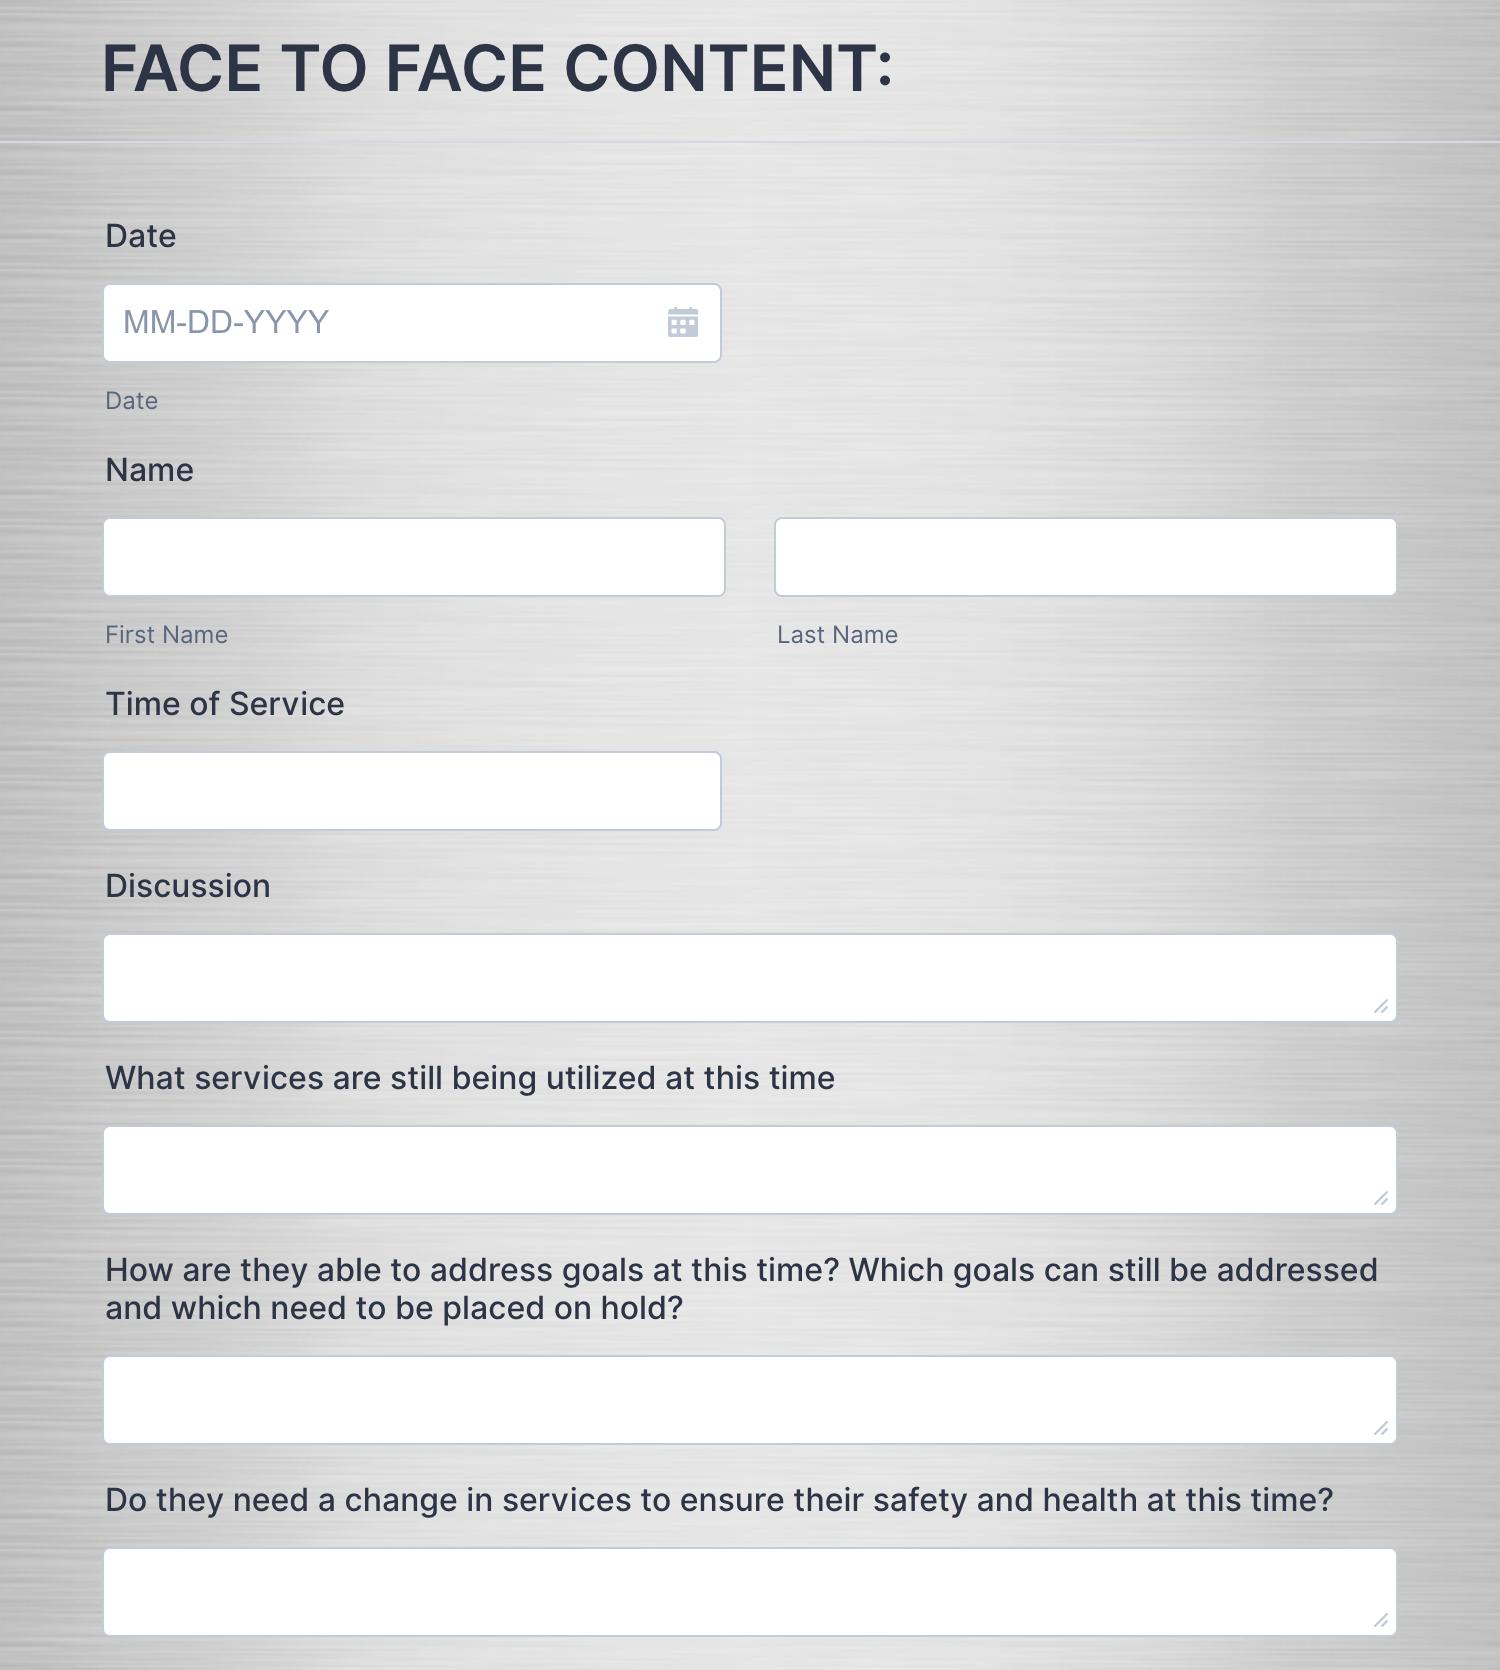 COVID-19 Questionnaire Template